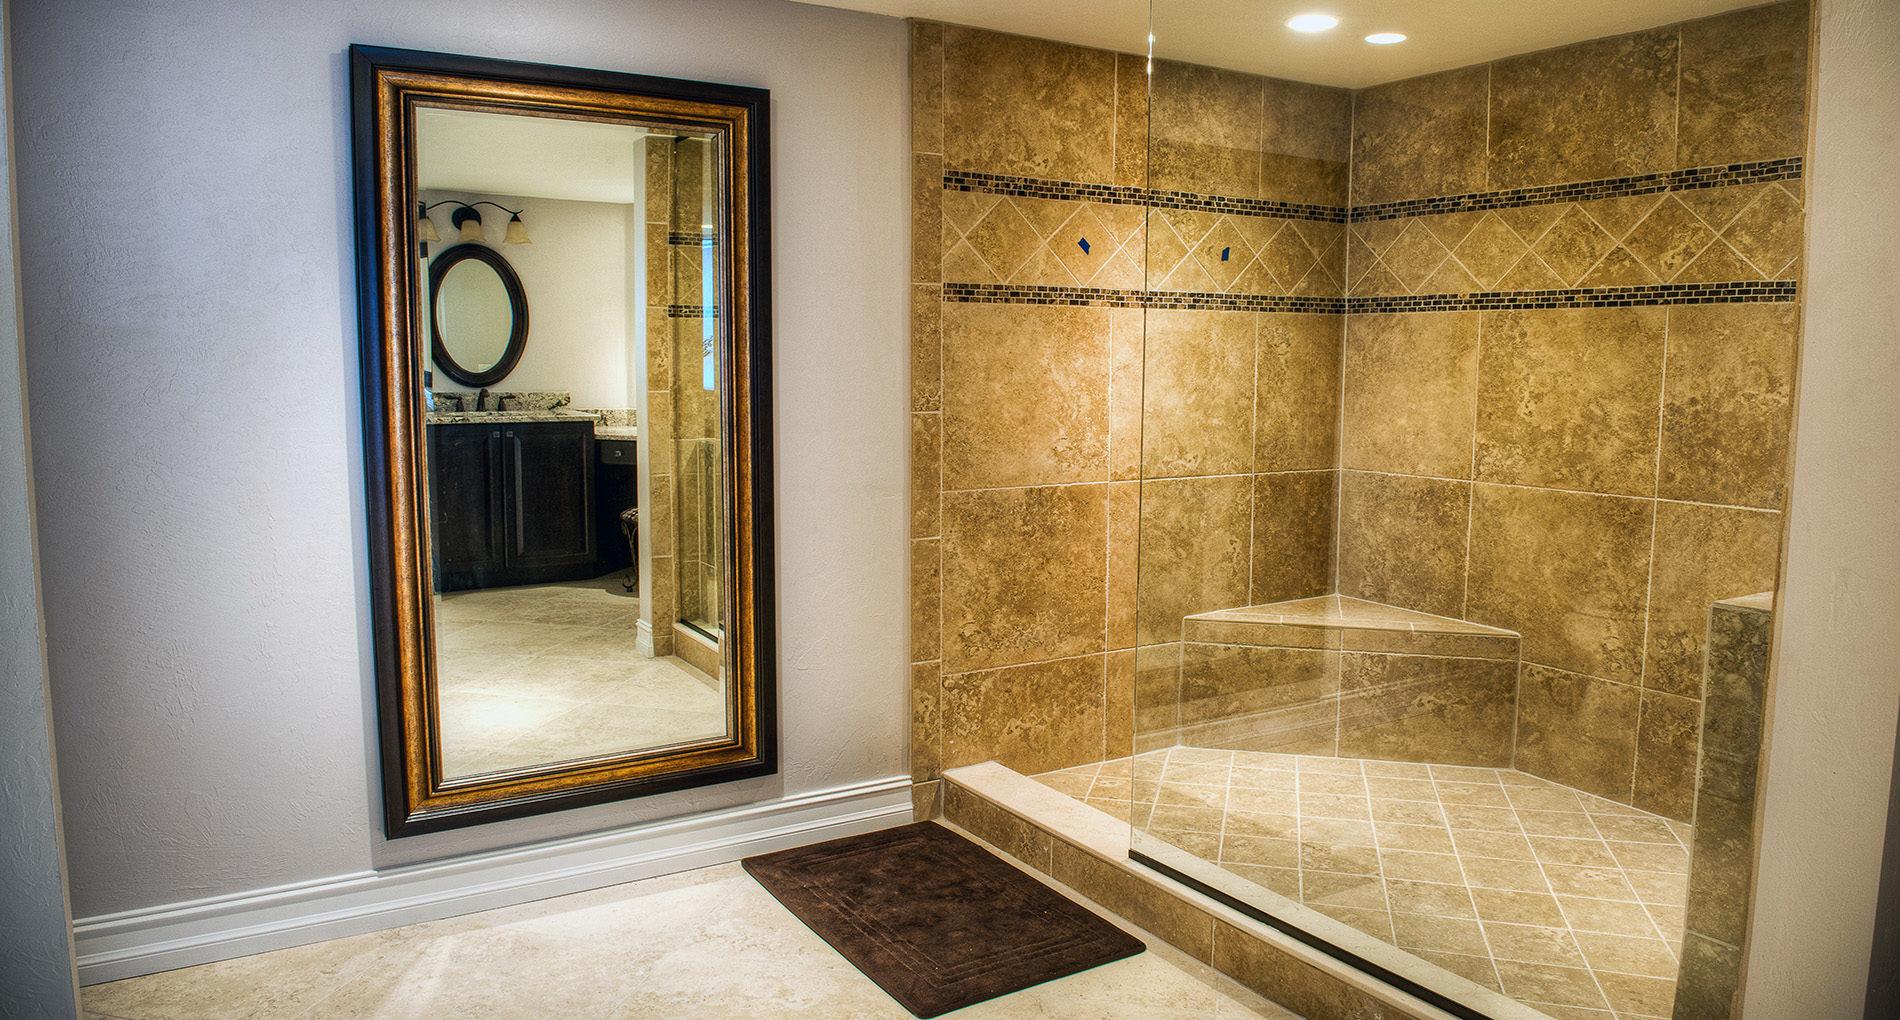 Bathroom Remodel Bonitasprings Marcoislandcondo Slider